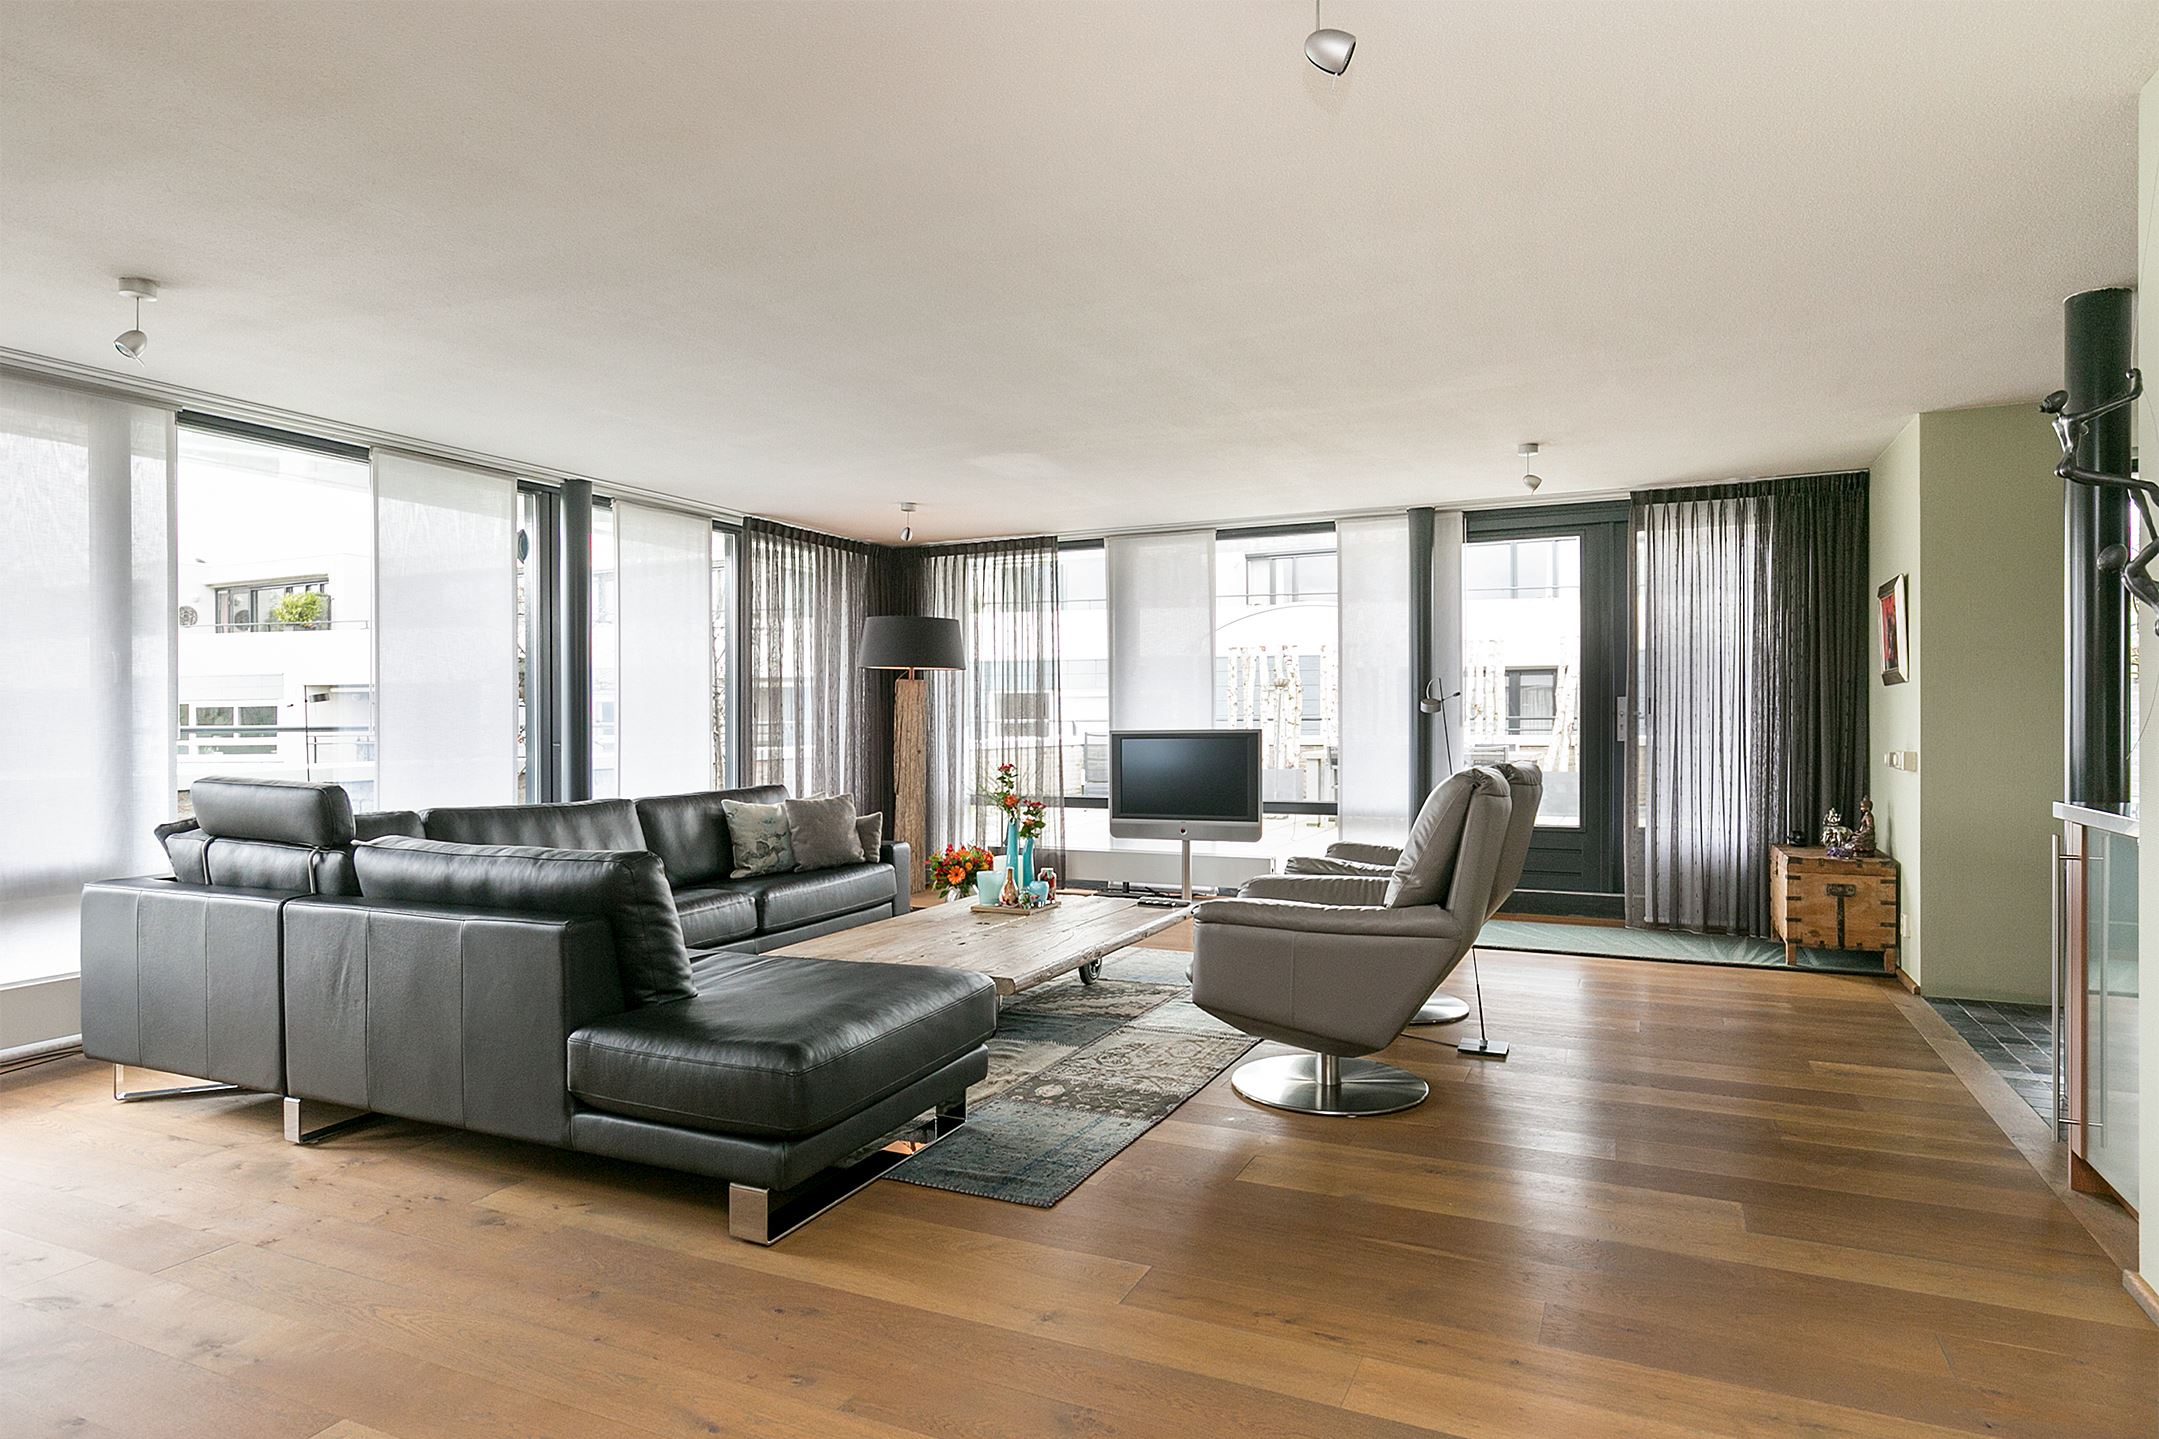 Appartement te koop: Gotenpark 41 5037 SL Tilburg [funda]